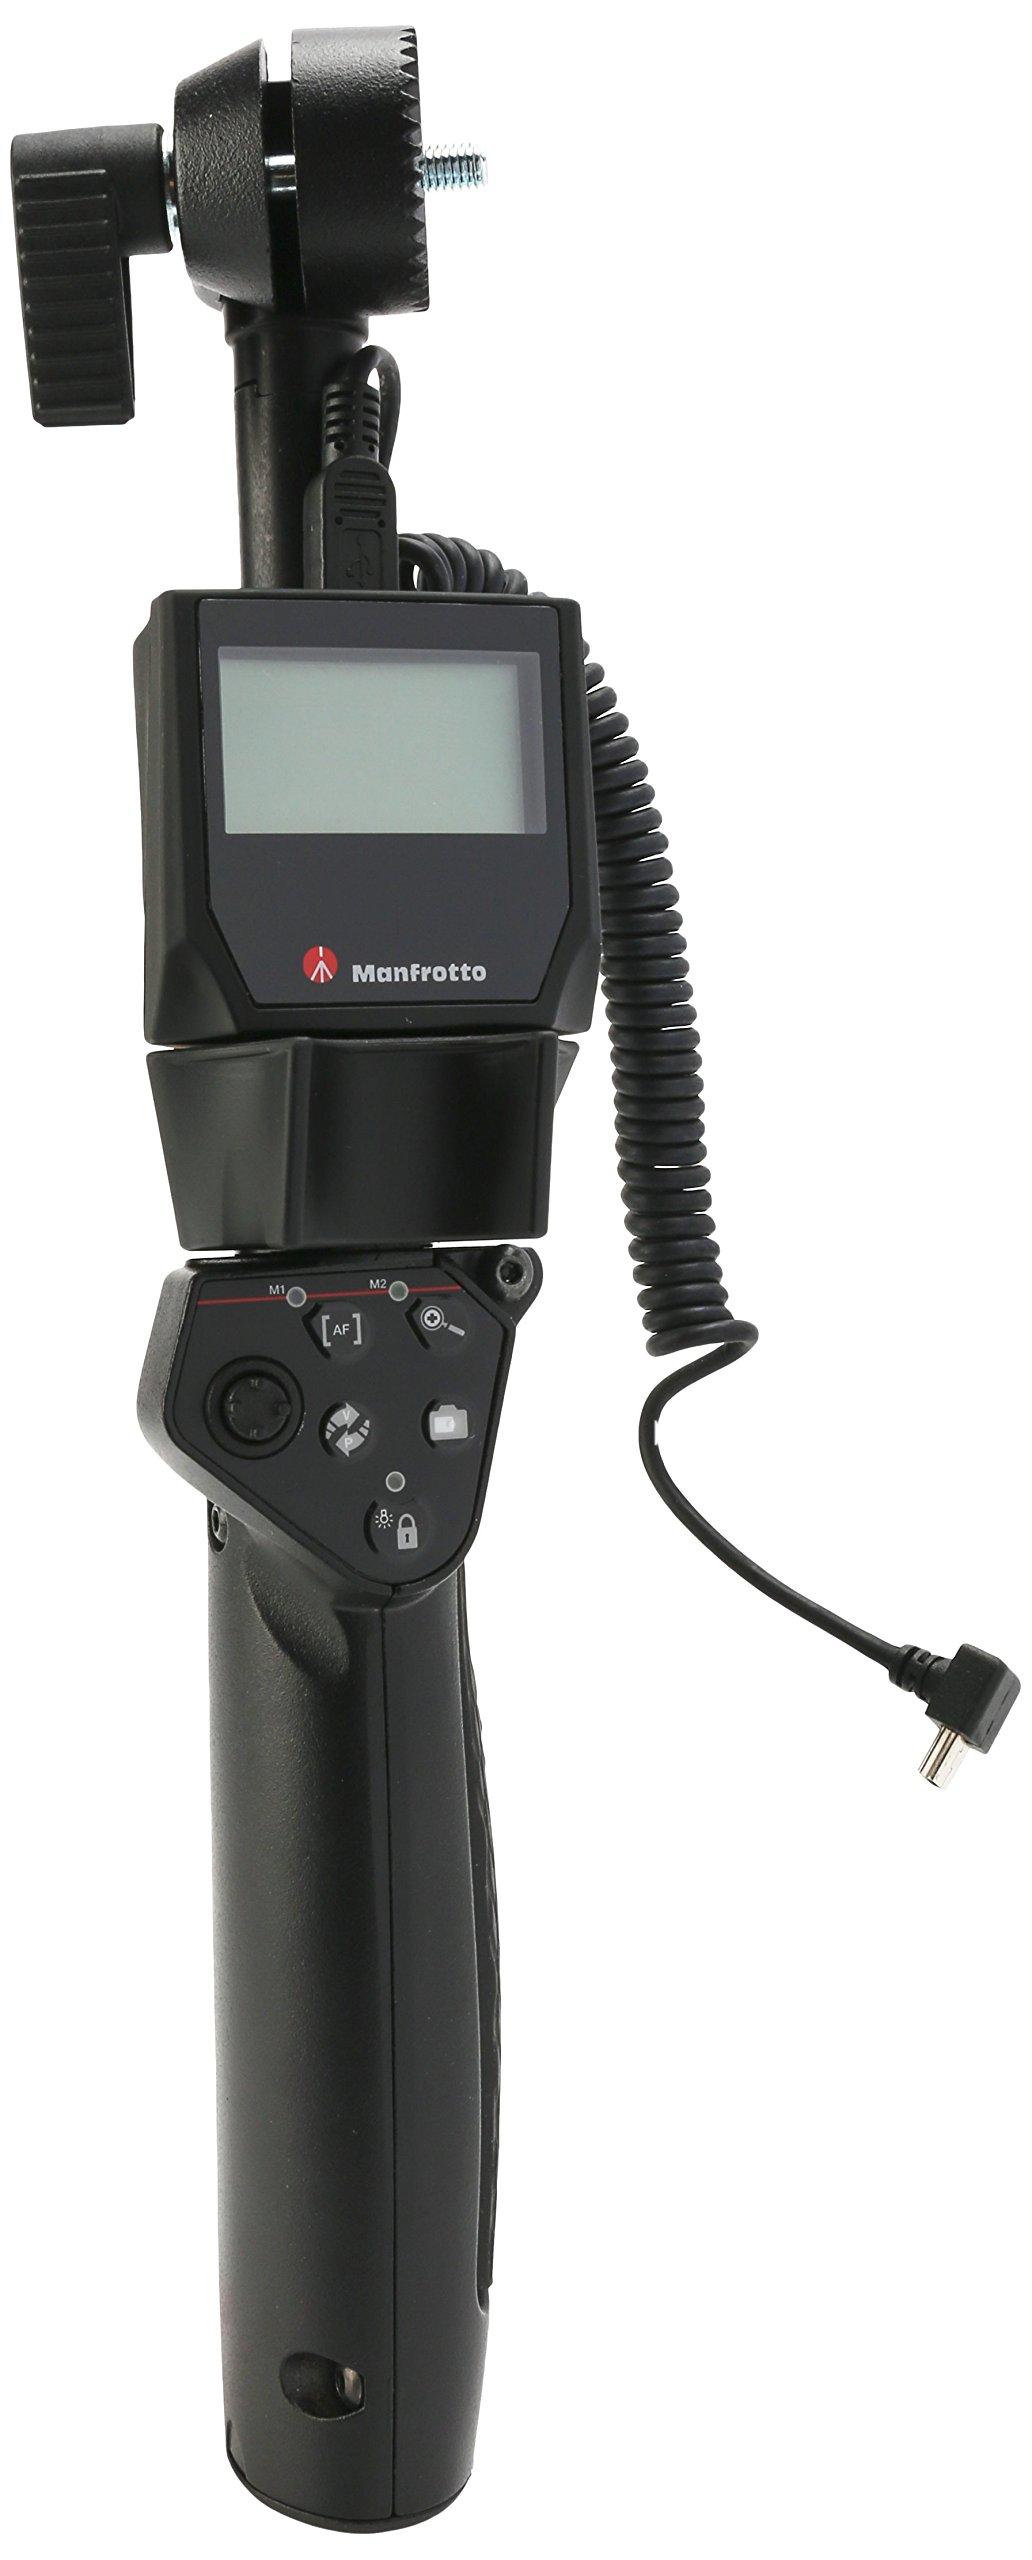 Manfrotto MVR911EJCN HDSLR Deluxe Remote Control for Canon (Black)